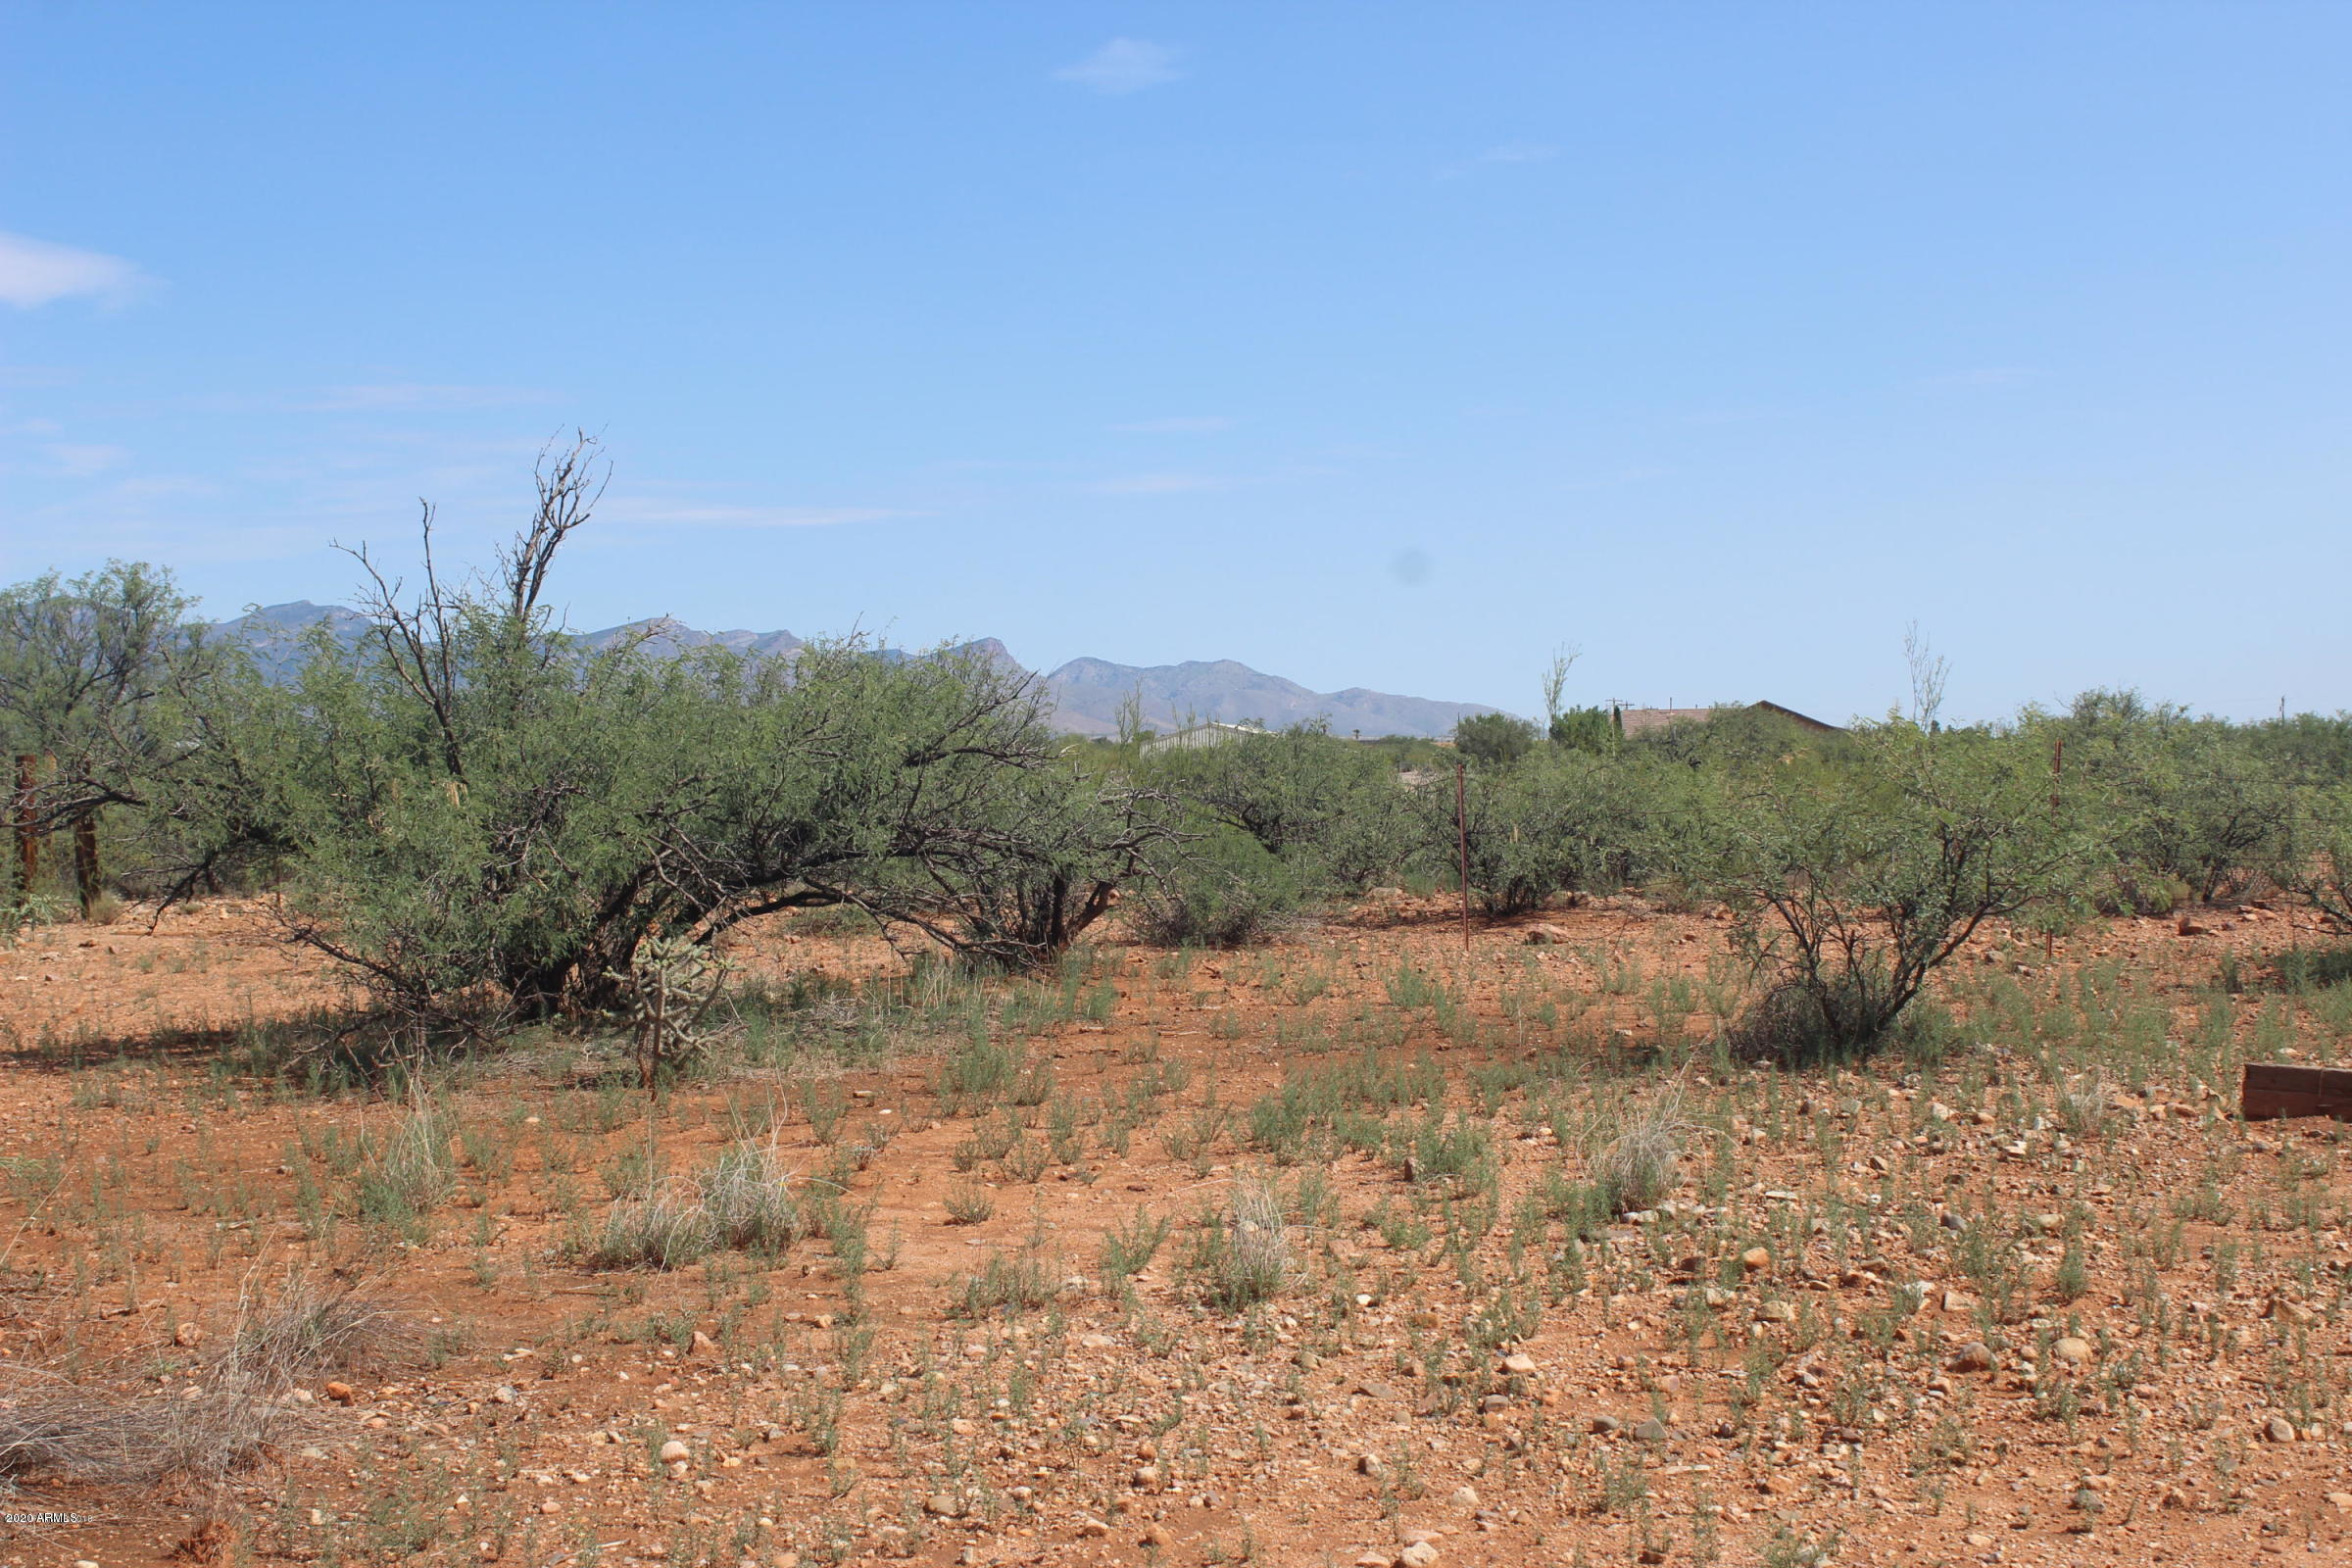 TBD Taylor 106-15-039 N Way, Huachuca City, Arizona 85616, ,Land,For Sale,TBD Taylor 106-15-039 N Way,6134091